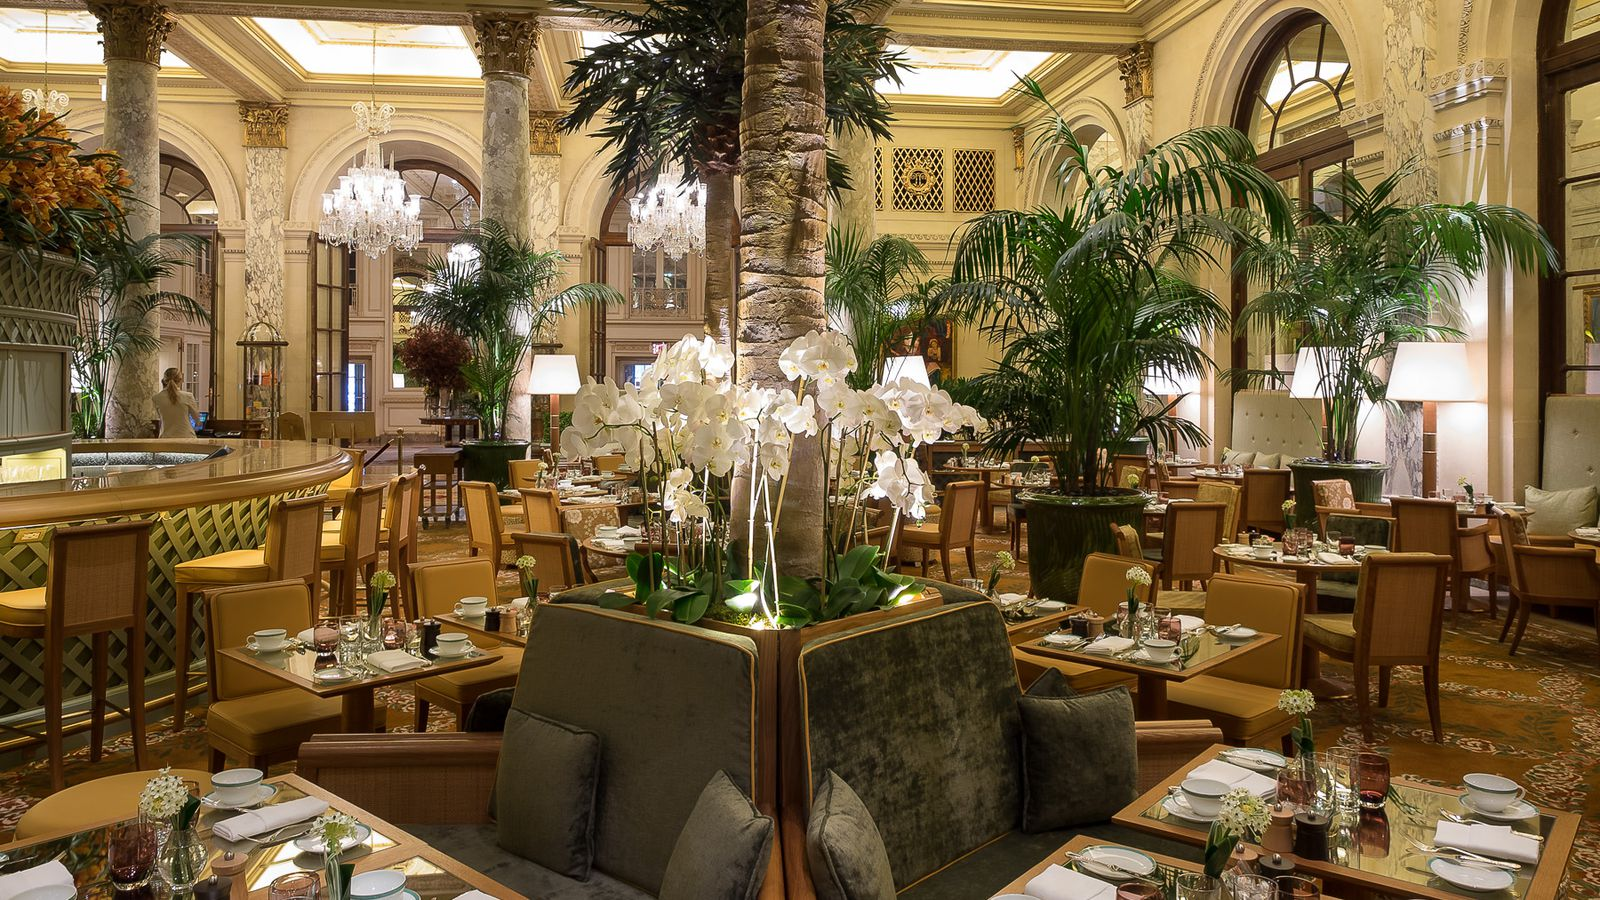 Food Hall Plaza Hotel S Basement